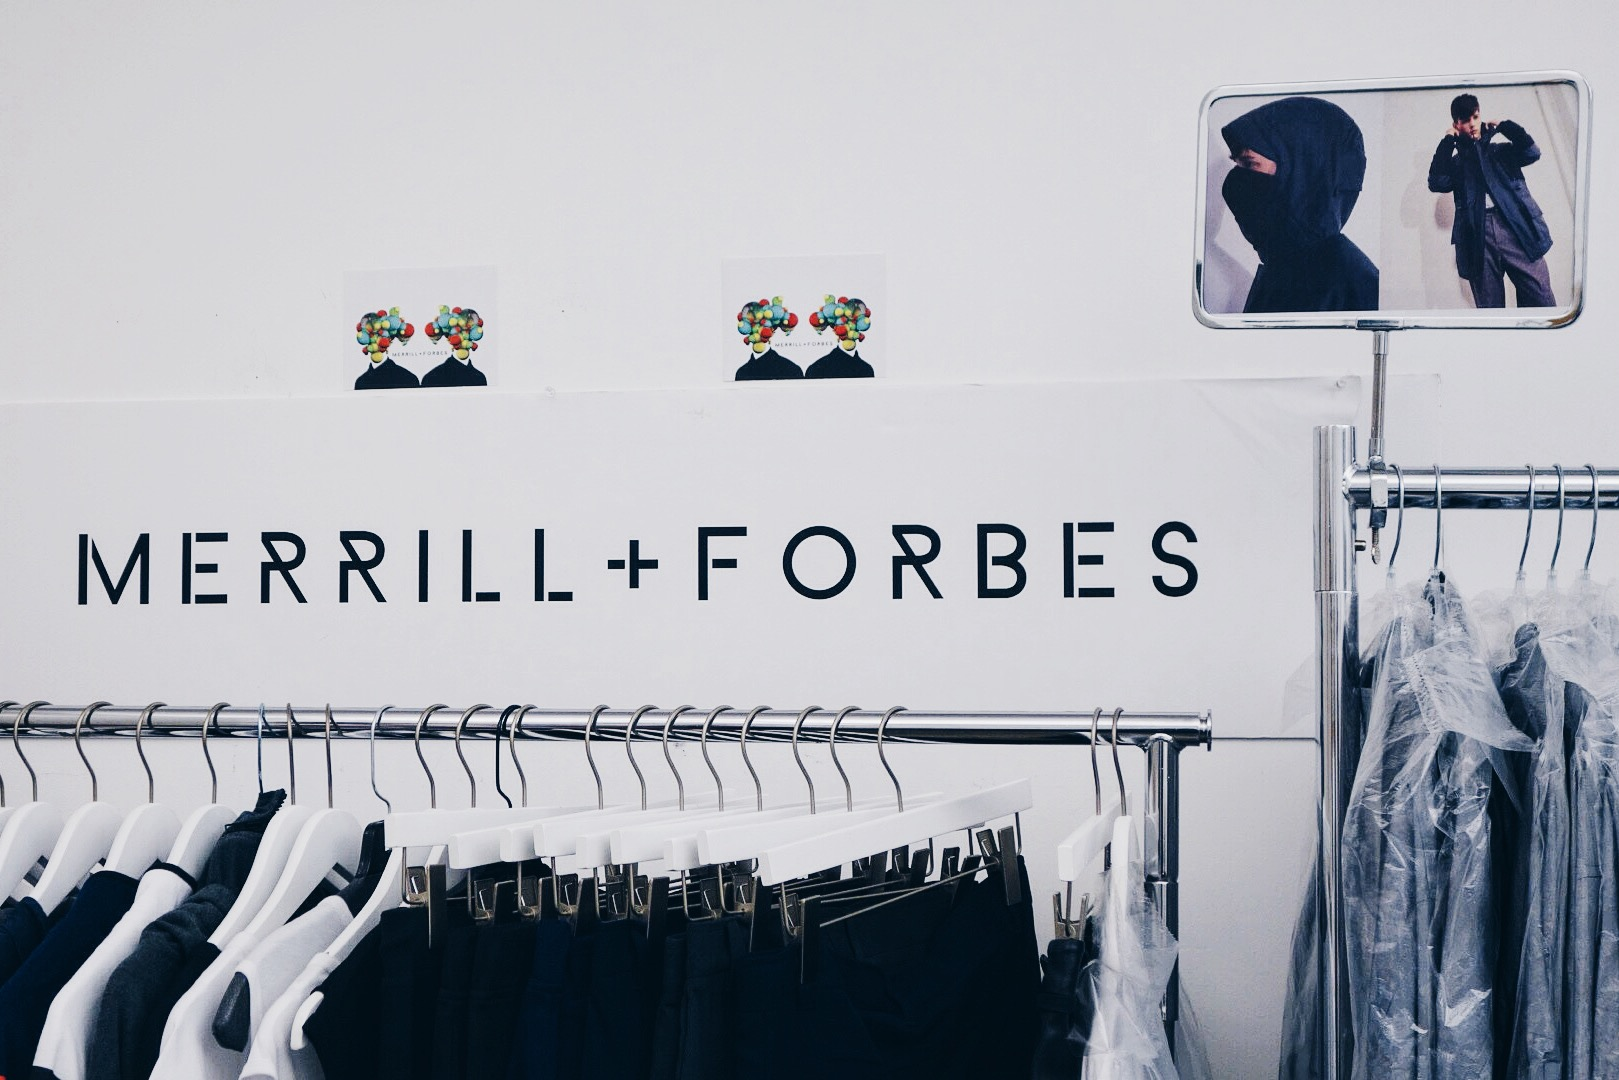 high-fashion menswear